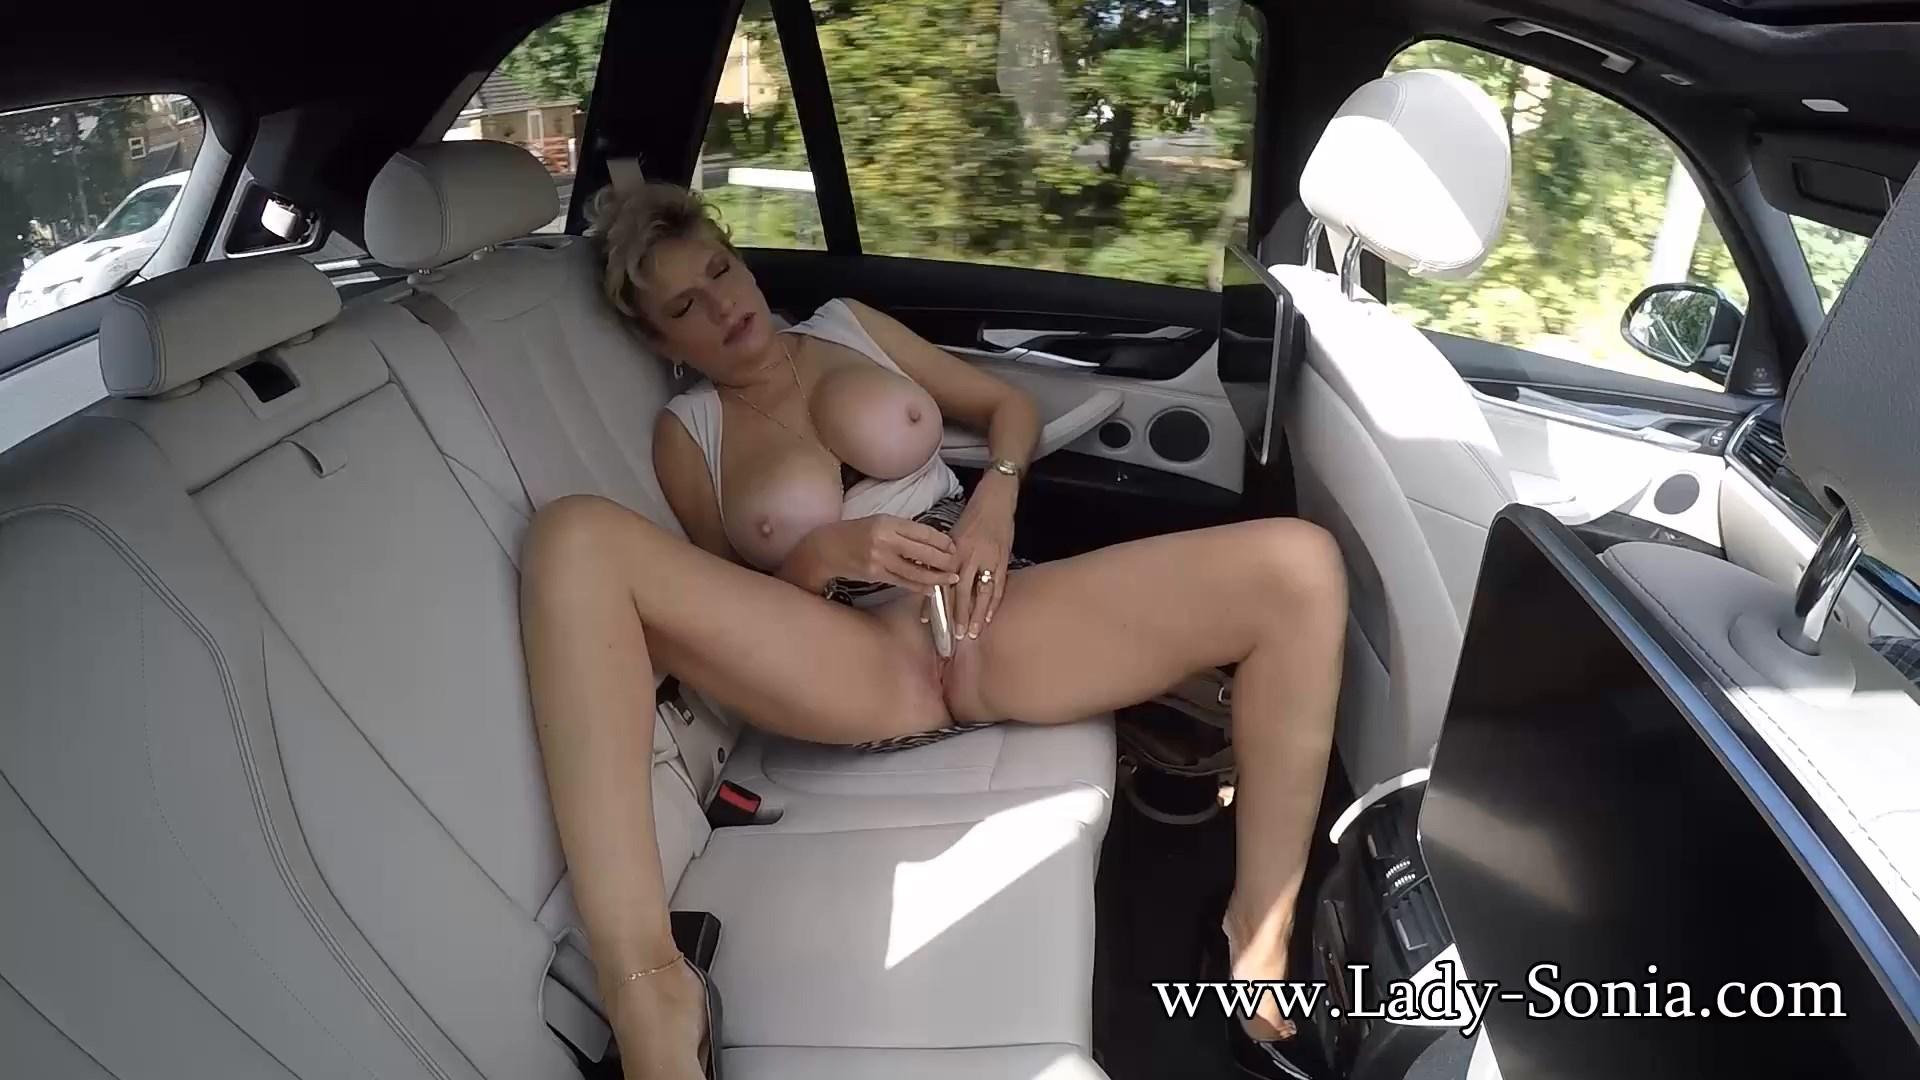 Lady Sonia - Flashing My Big Tits In The Car